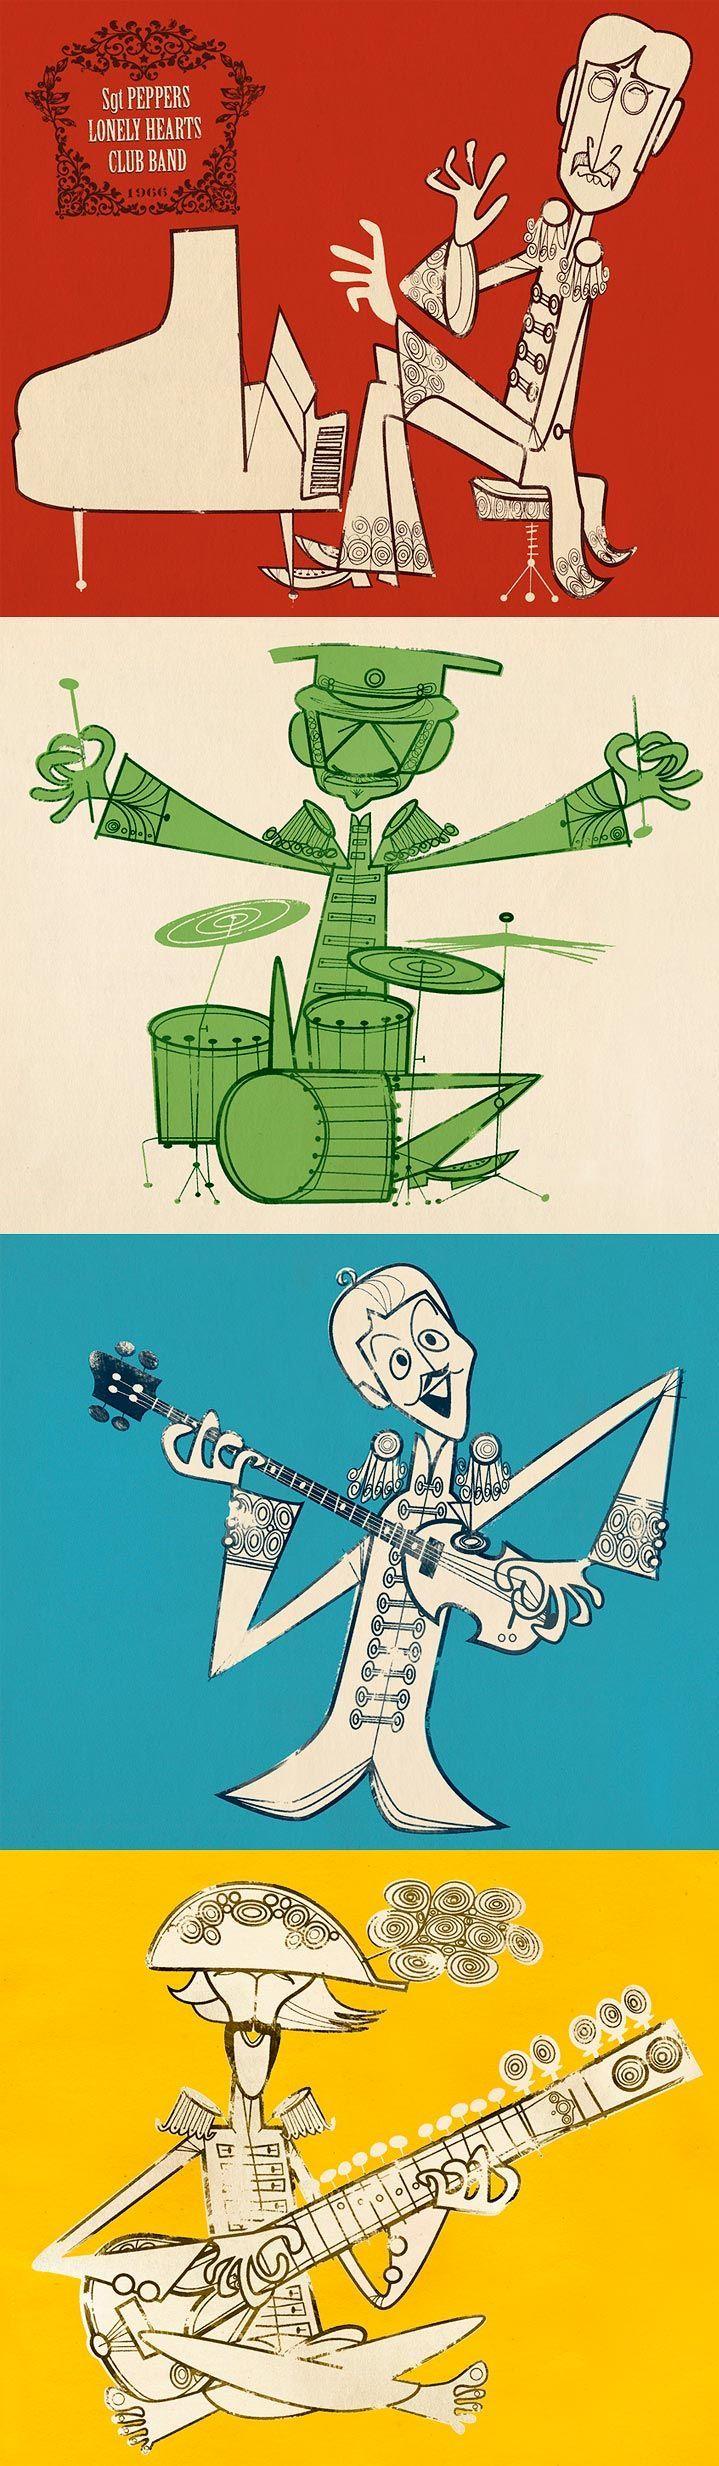 Jonas Bergstrand | Illustrators | Central Illustration Agency #illustration #music #thebeatles